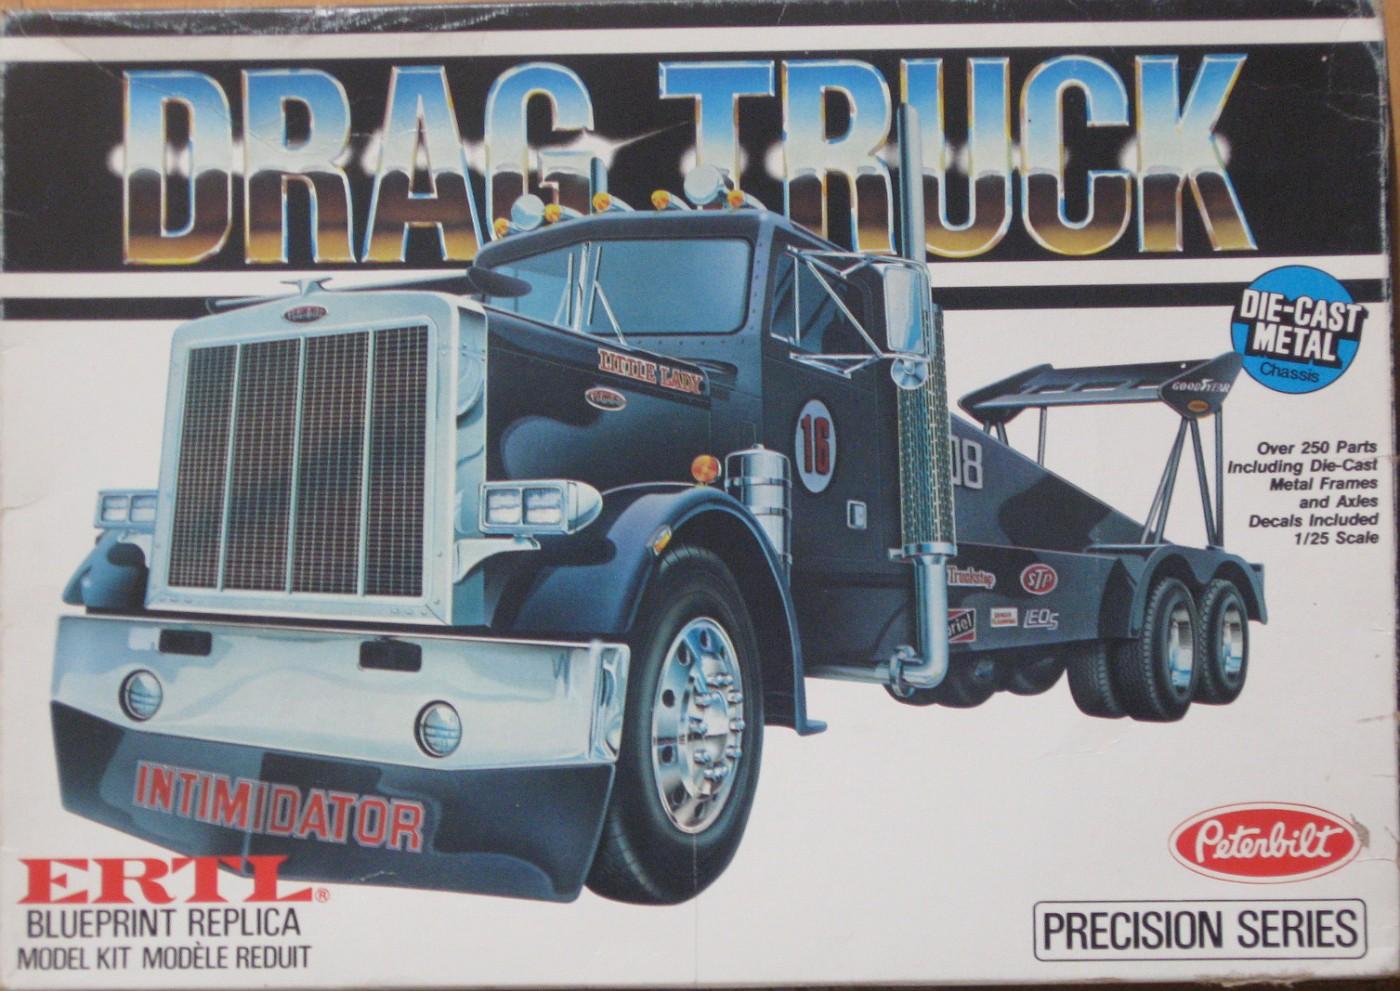 Ertl 8040 Drag truck